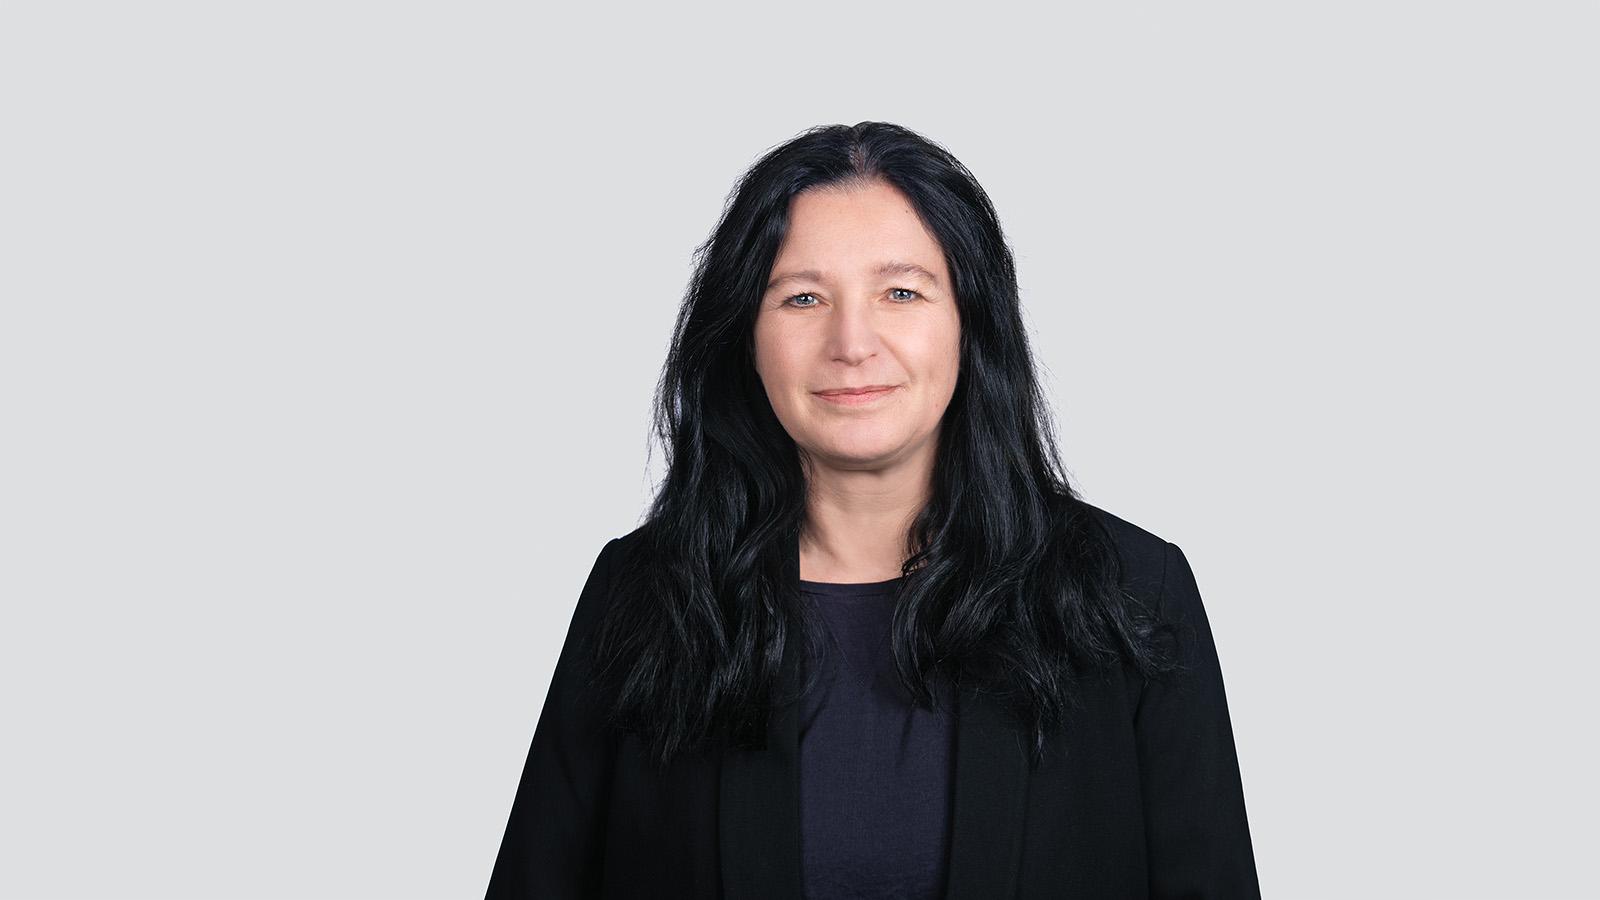 Doreen Hildebrandt